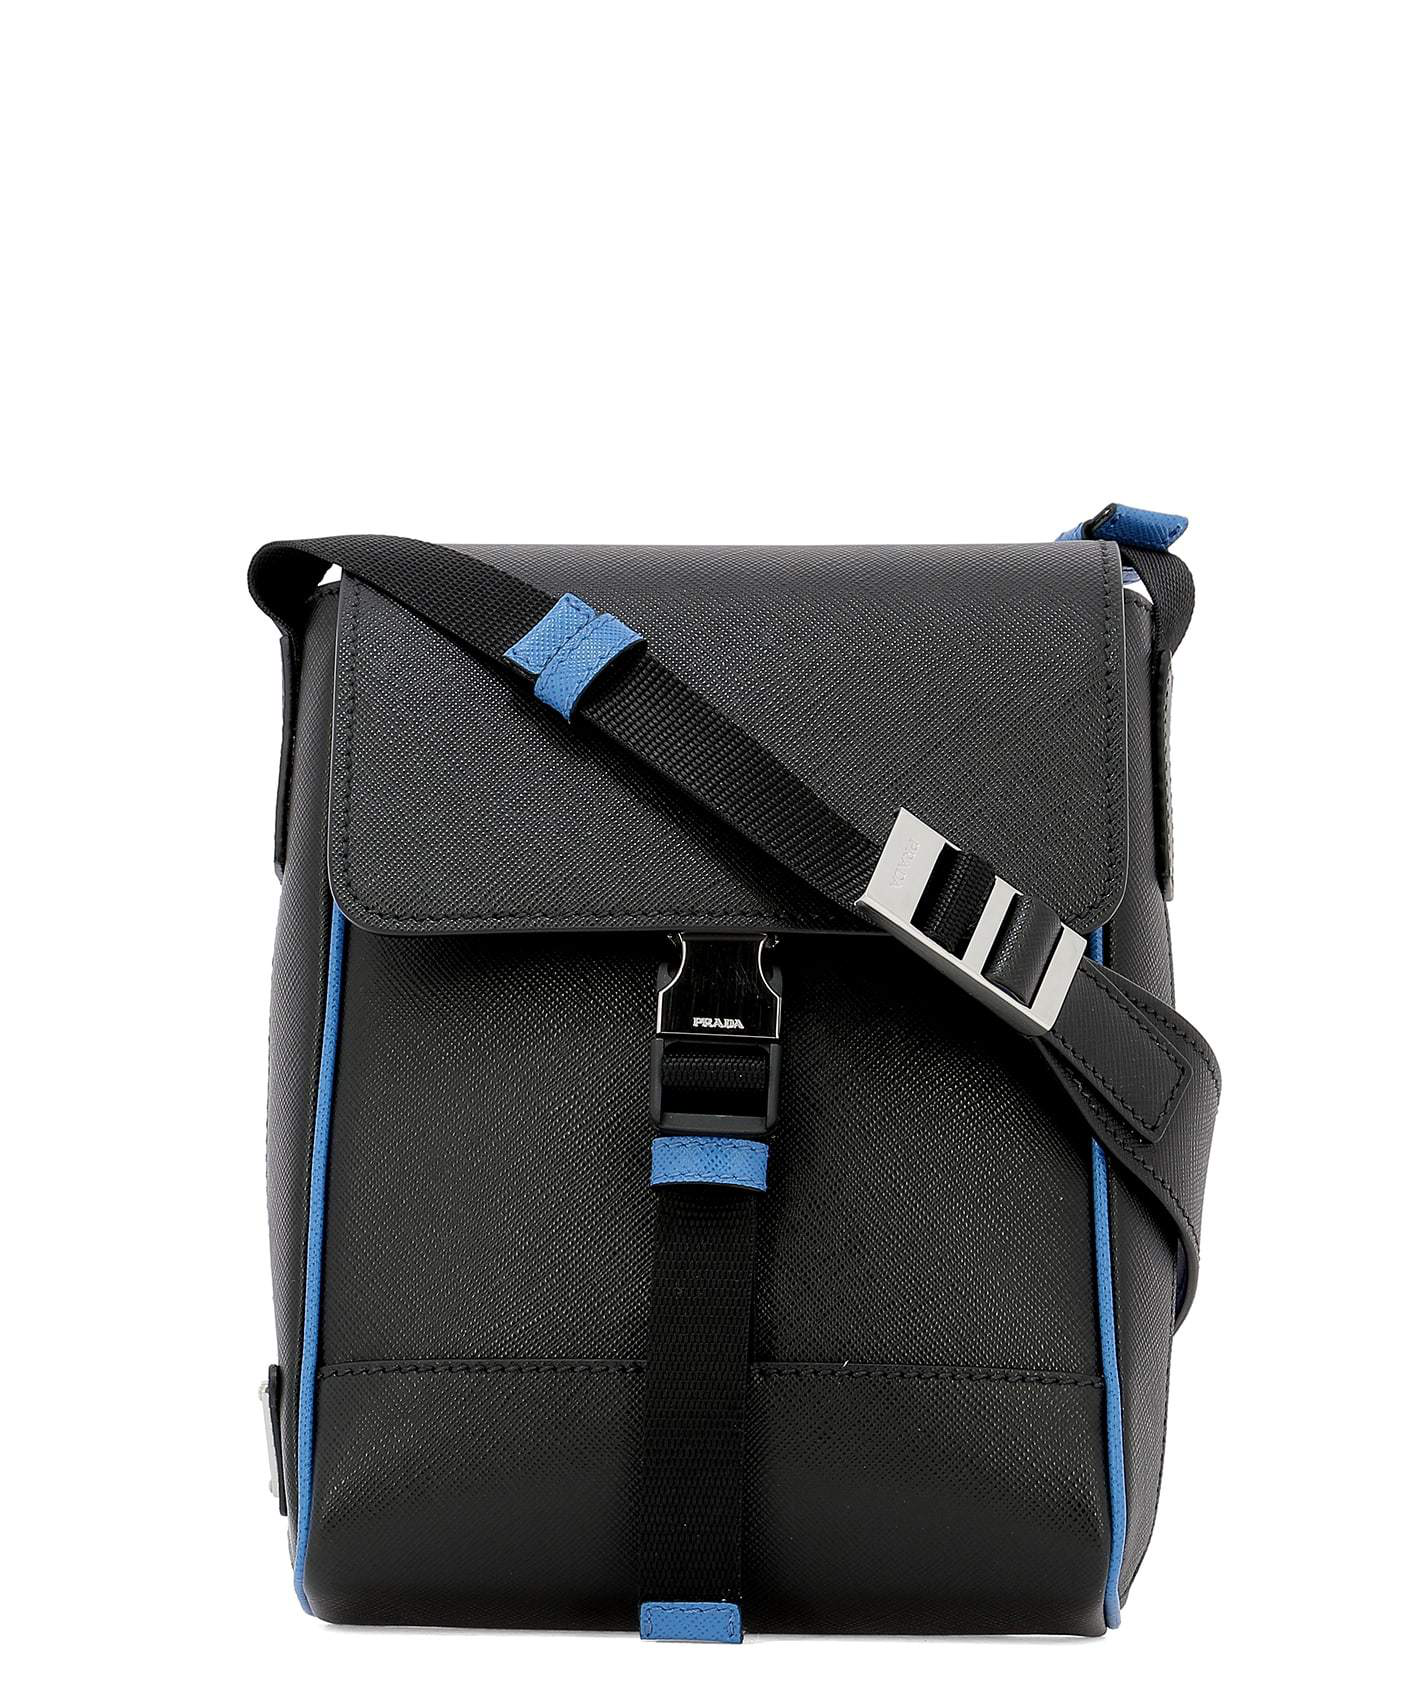 41fc5d1b0f Prada Saffiano Messenger Bag In Black